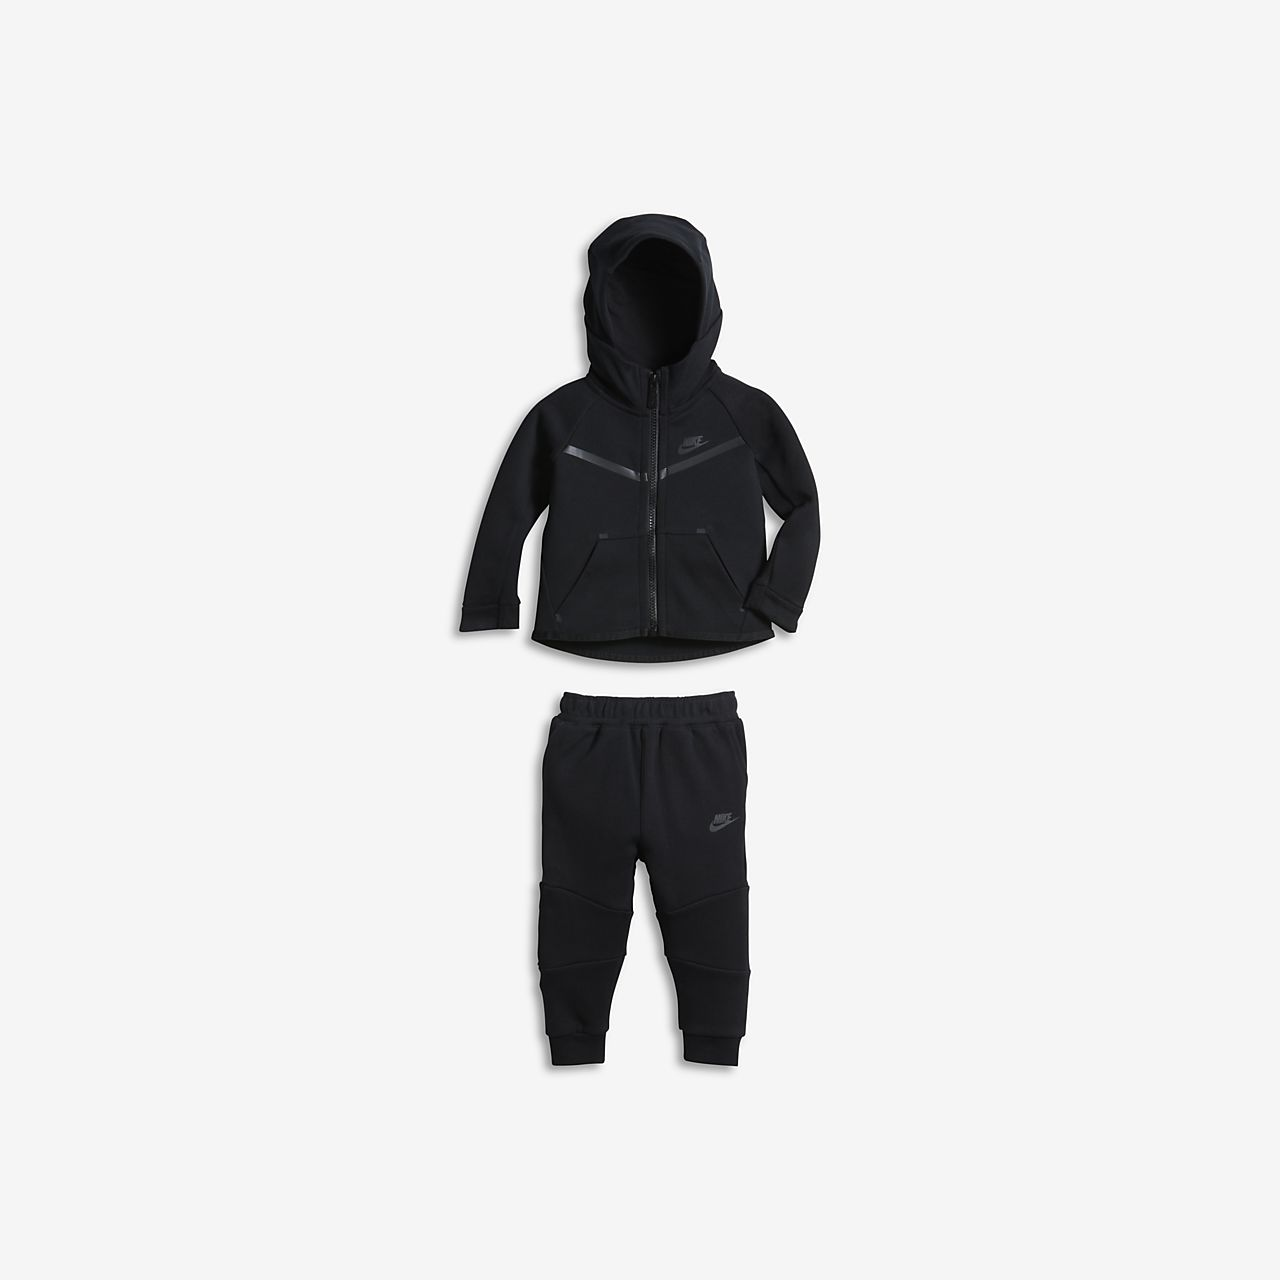 Completo in 2 pezzi Nike Tech Fleece - Neonati